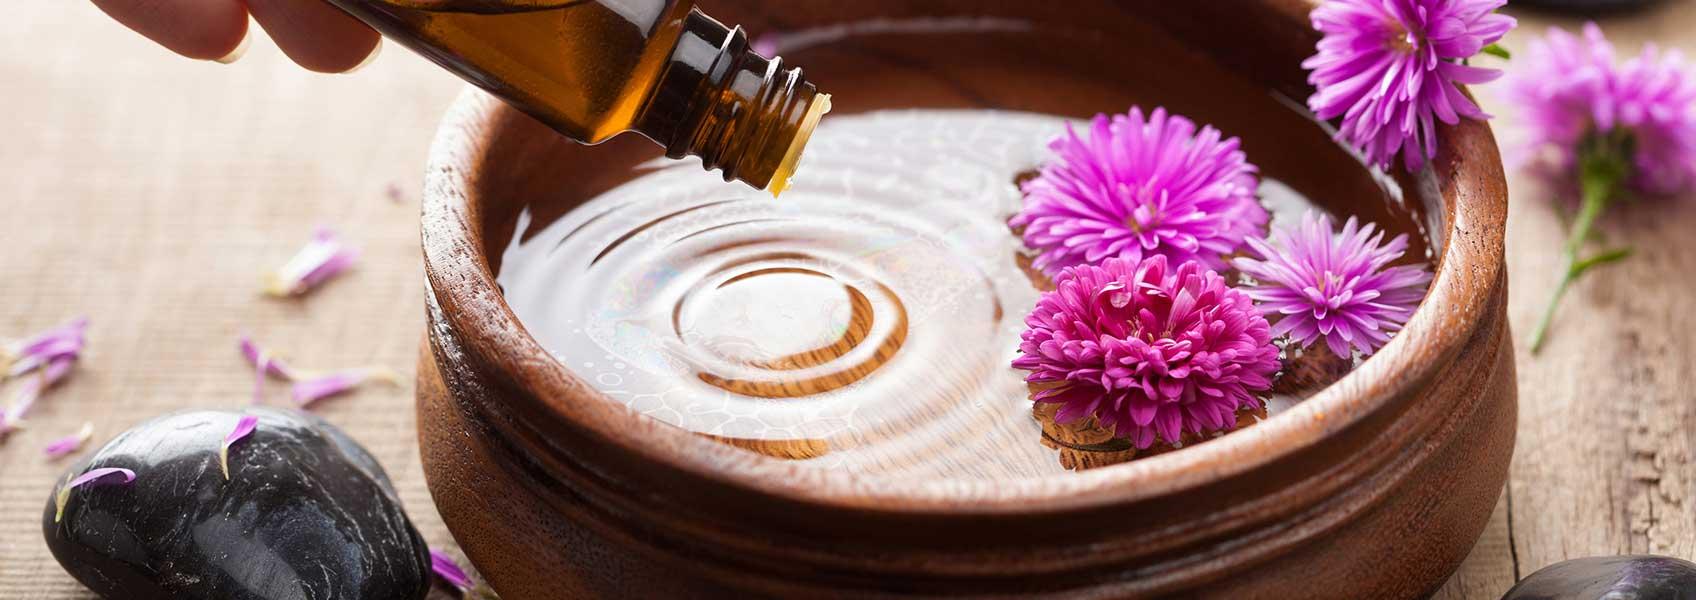 Medecine alternative et huile